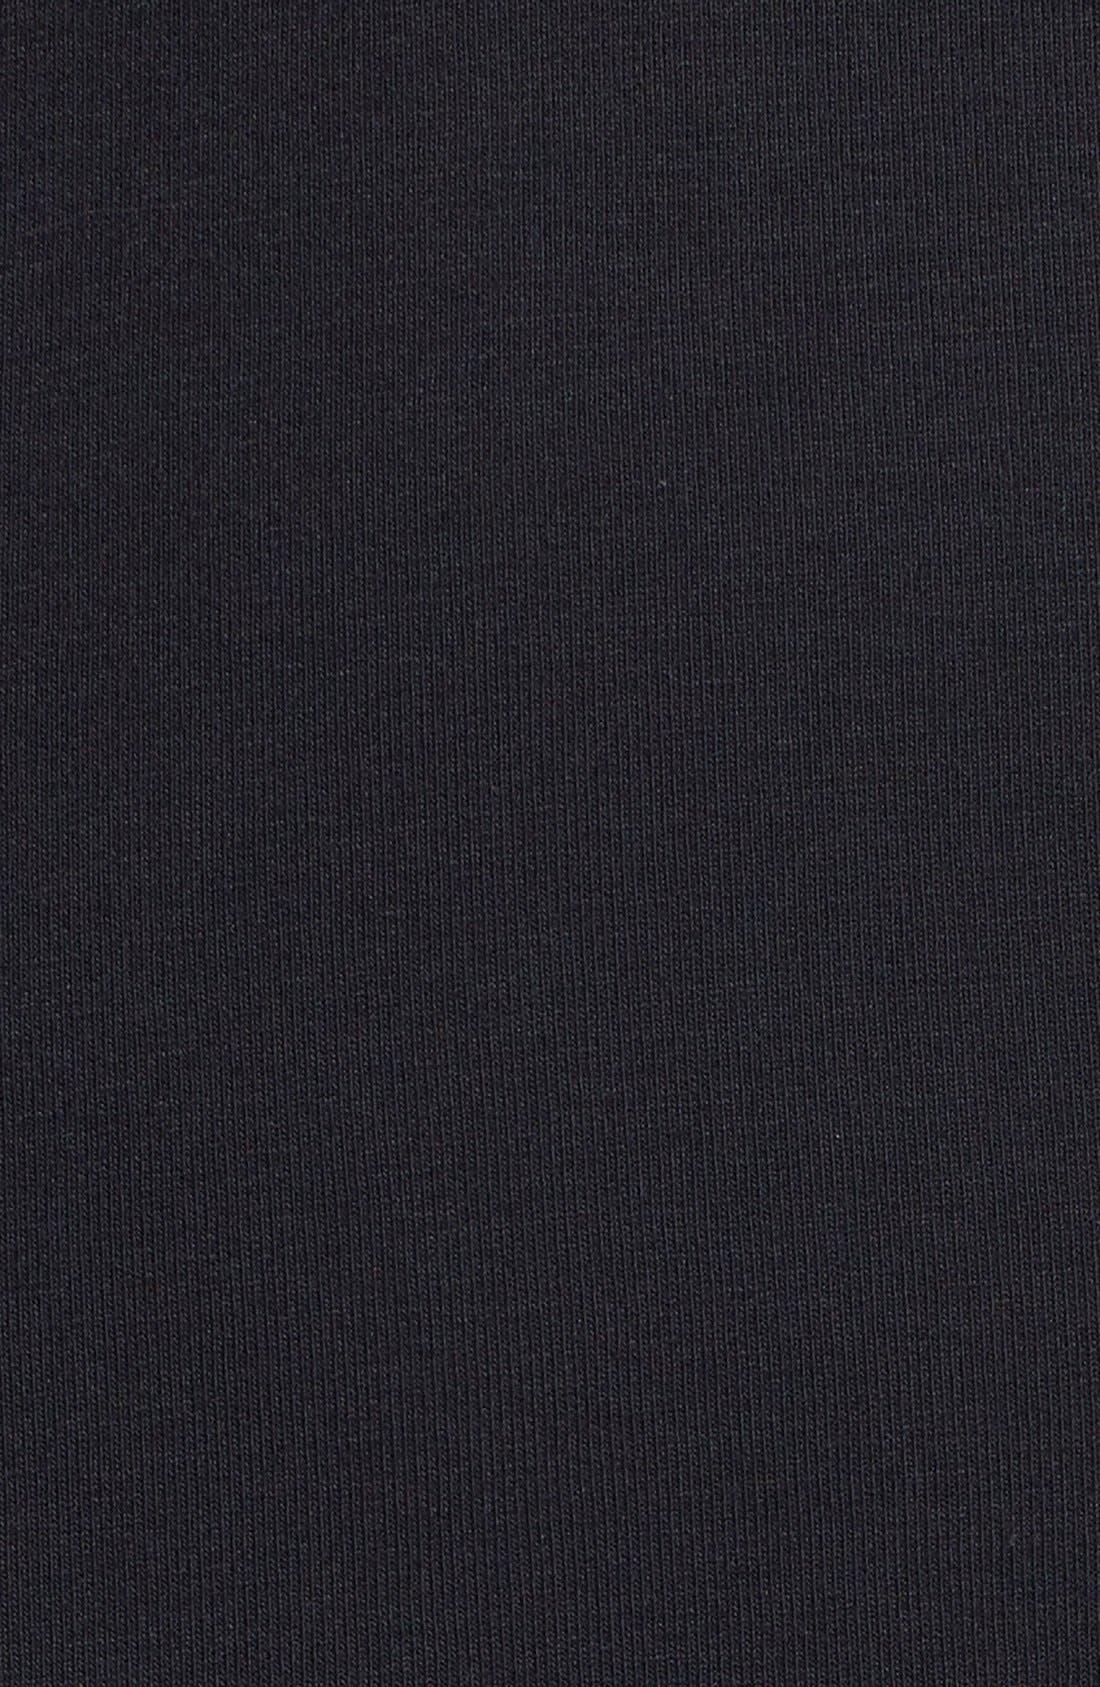 BCBGMAXAZRIA, 'Livi' Lace & Jersey Knit Sheath Dress, Alternate thumbnail 3, color, 001